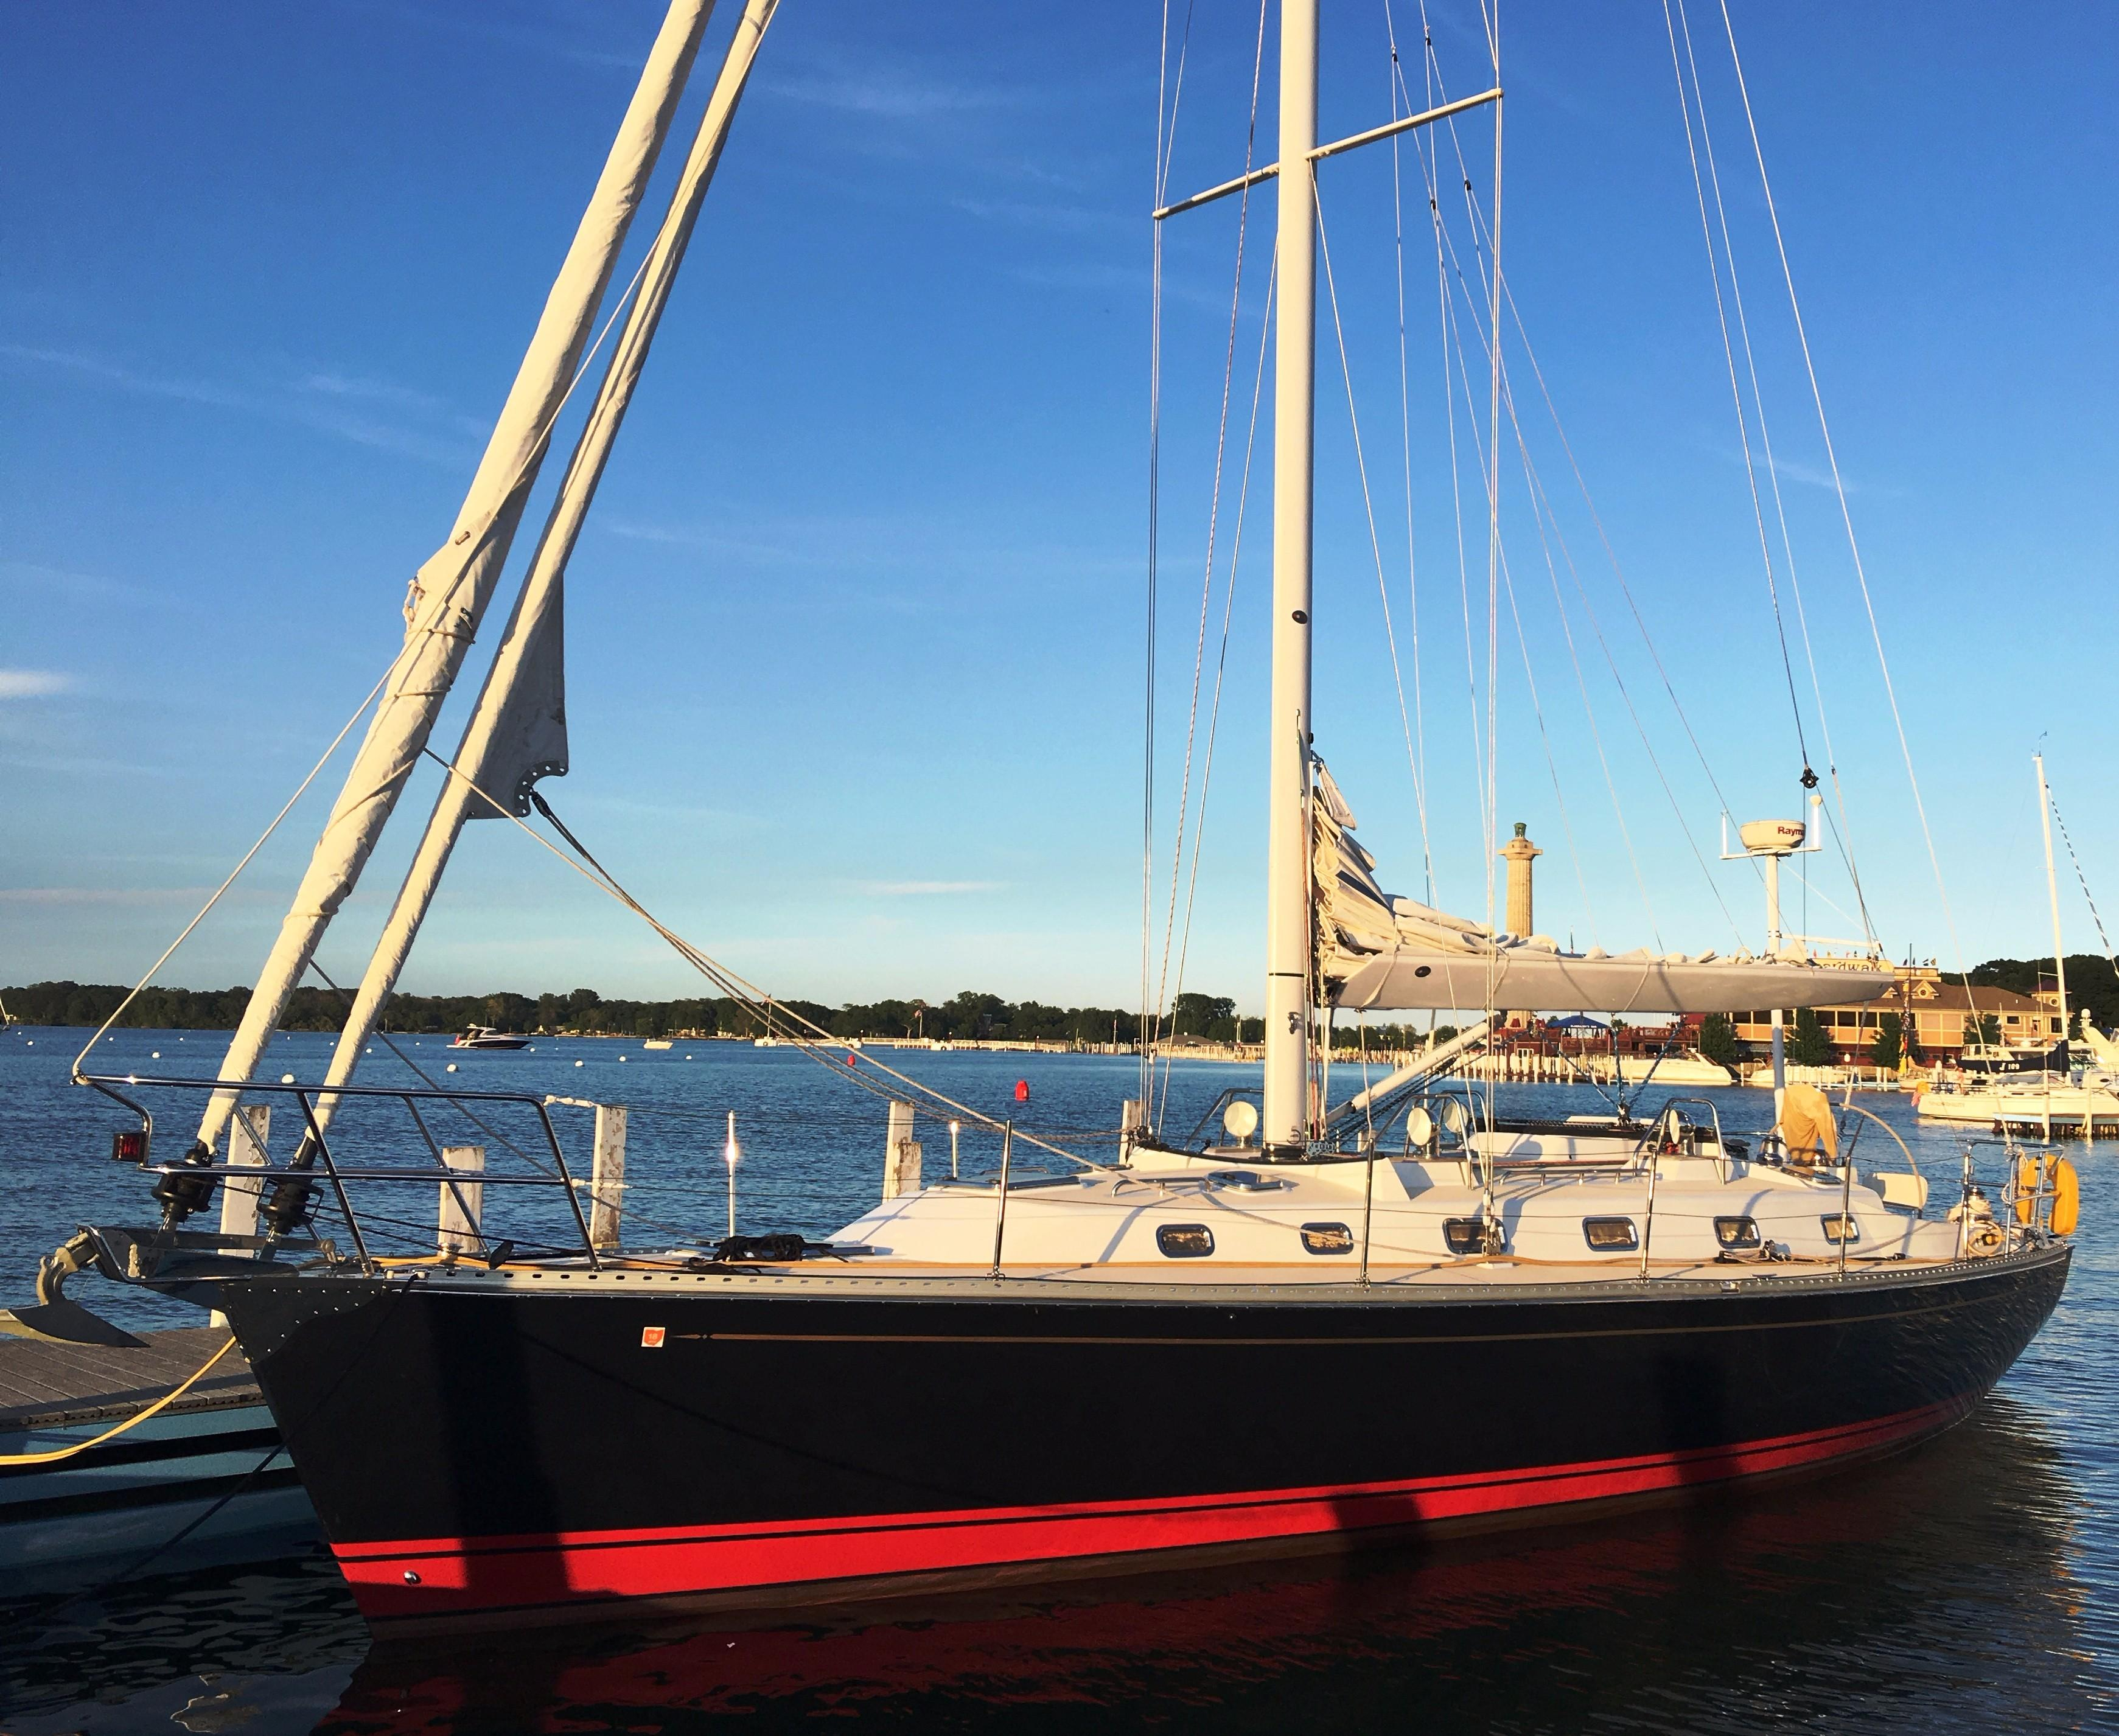 Used Sailboats Lake Erie | Sailboat & Powerboats Yacht